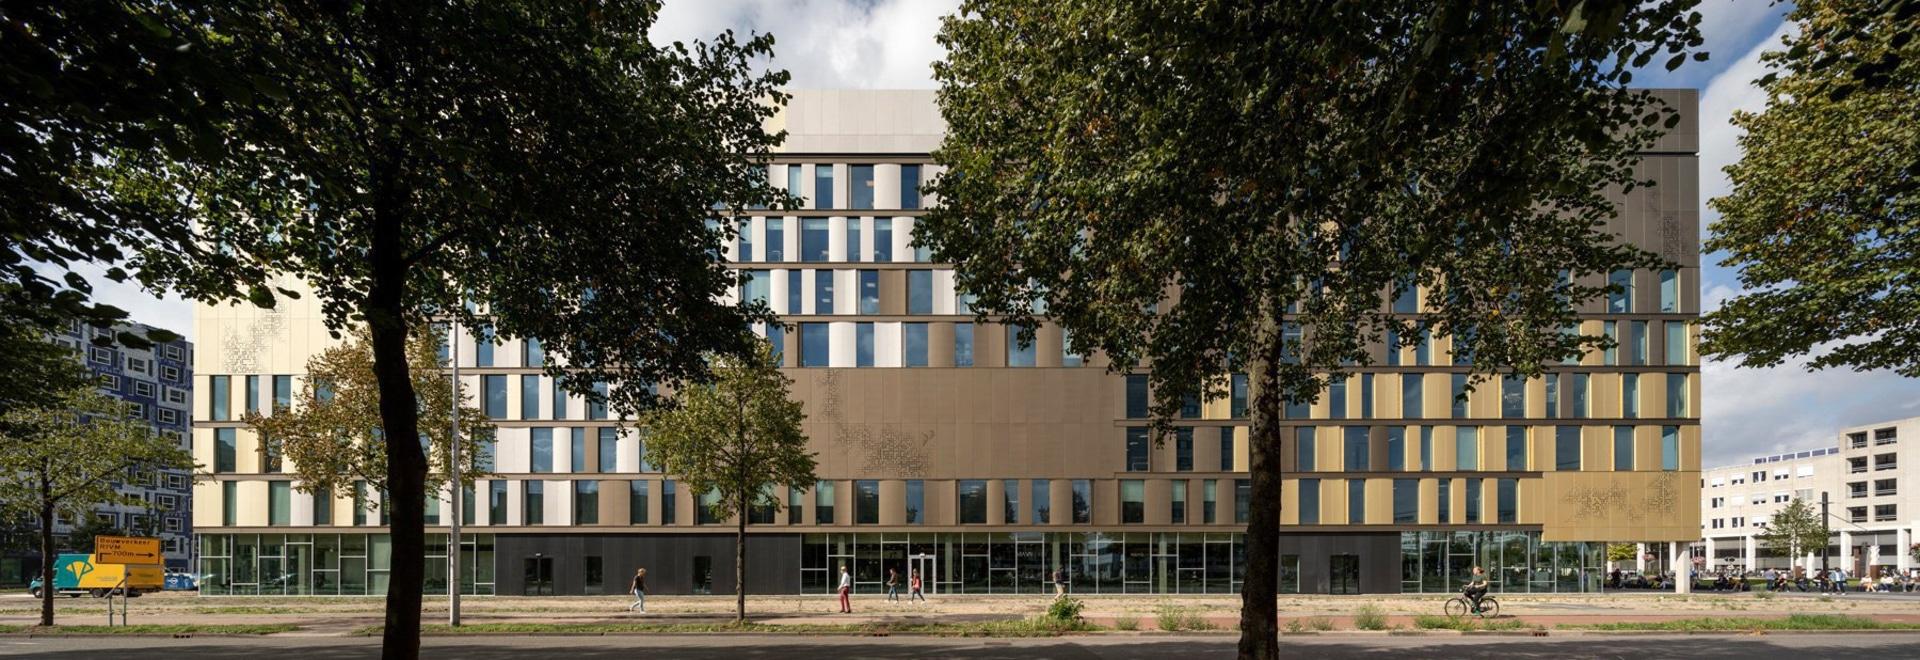 schmidt hammer lassen connects dutch university's facilities with crisscrossing stairways